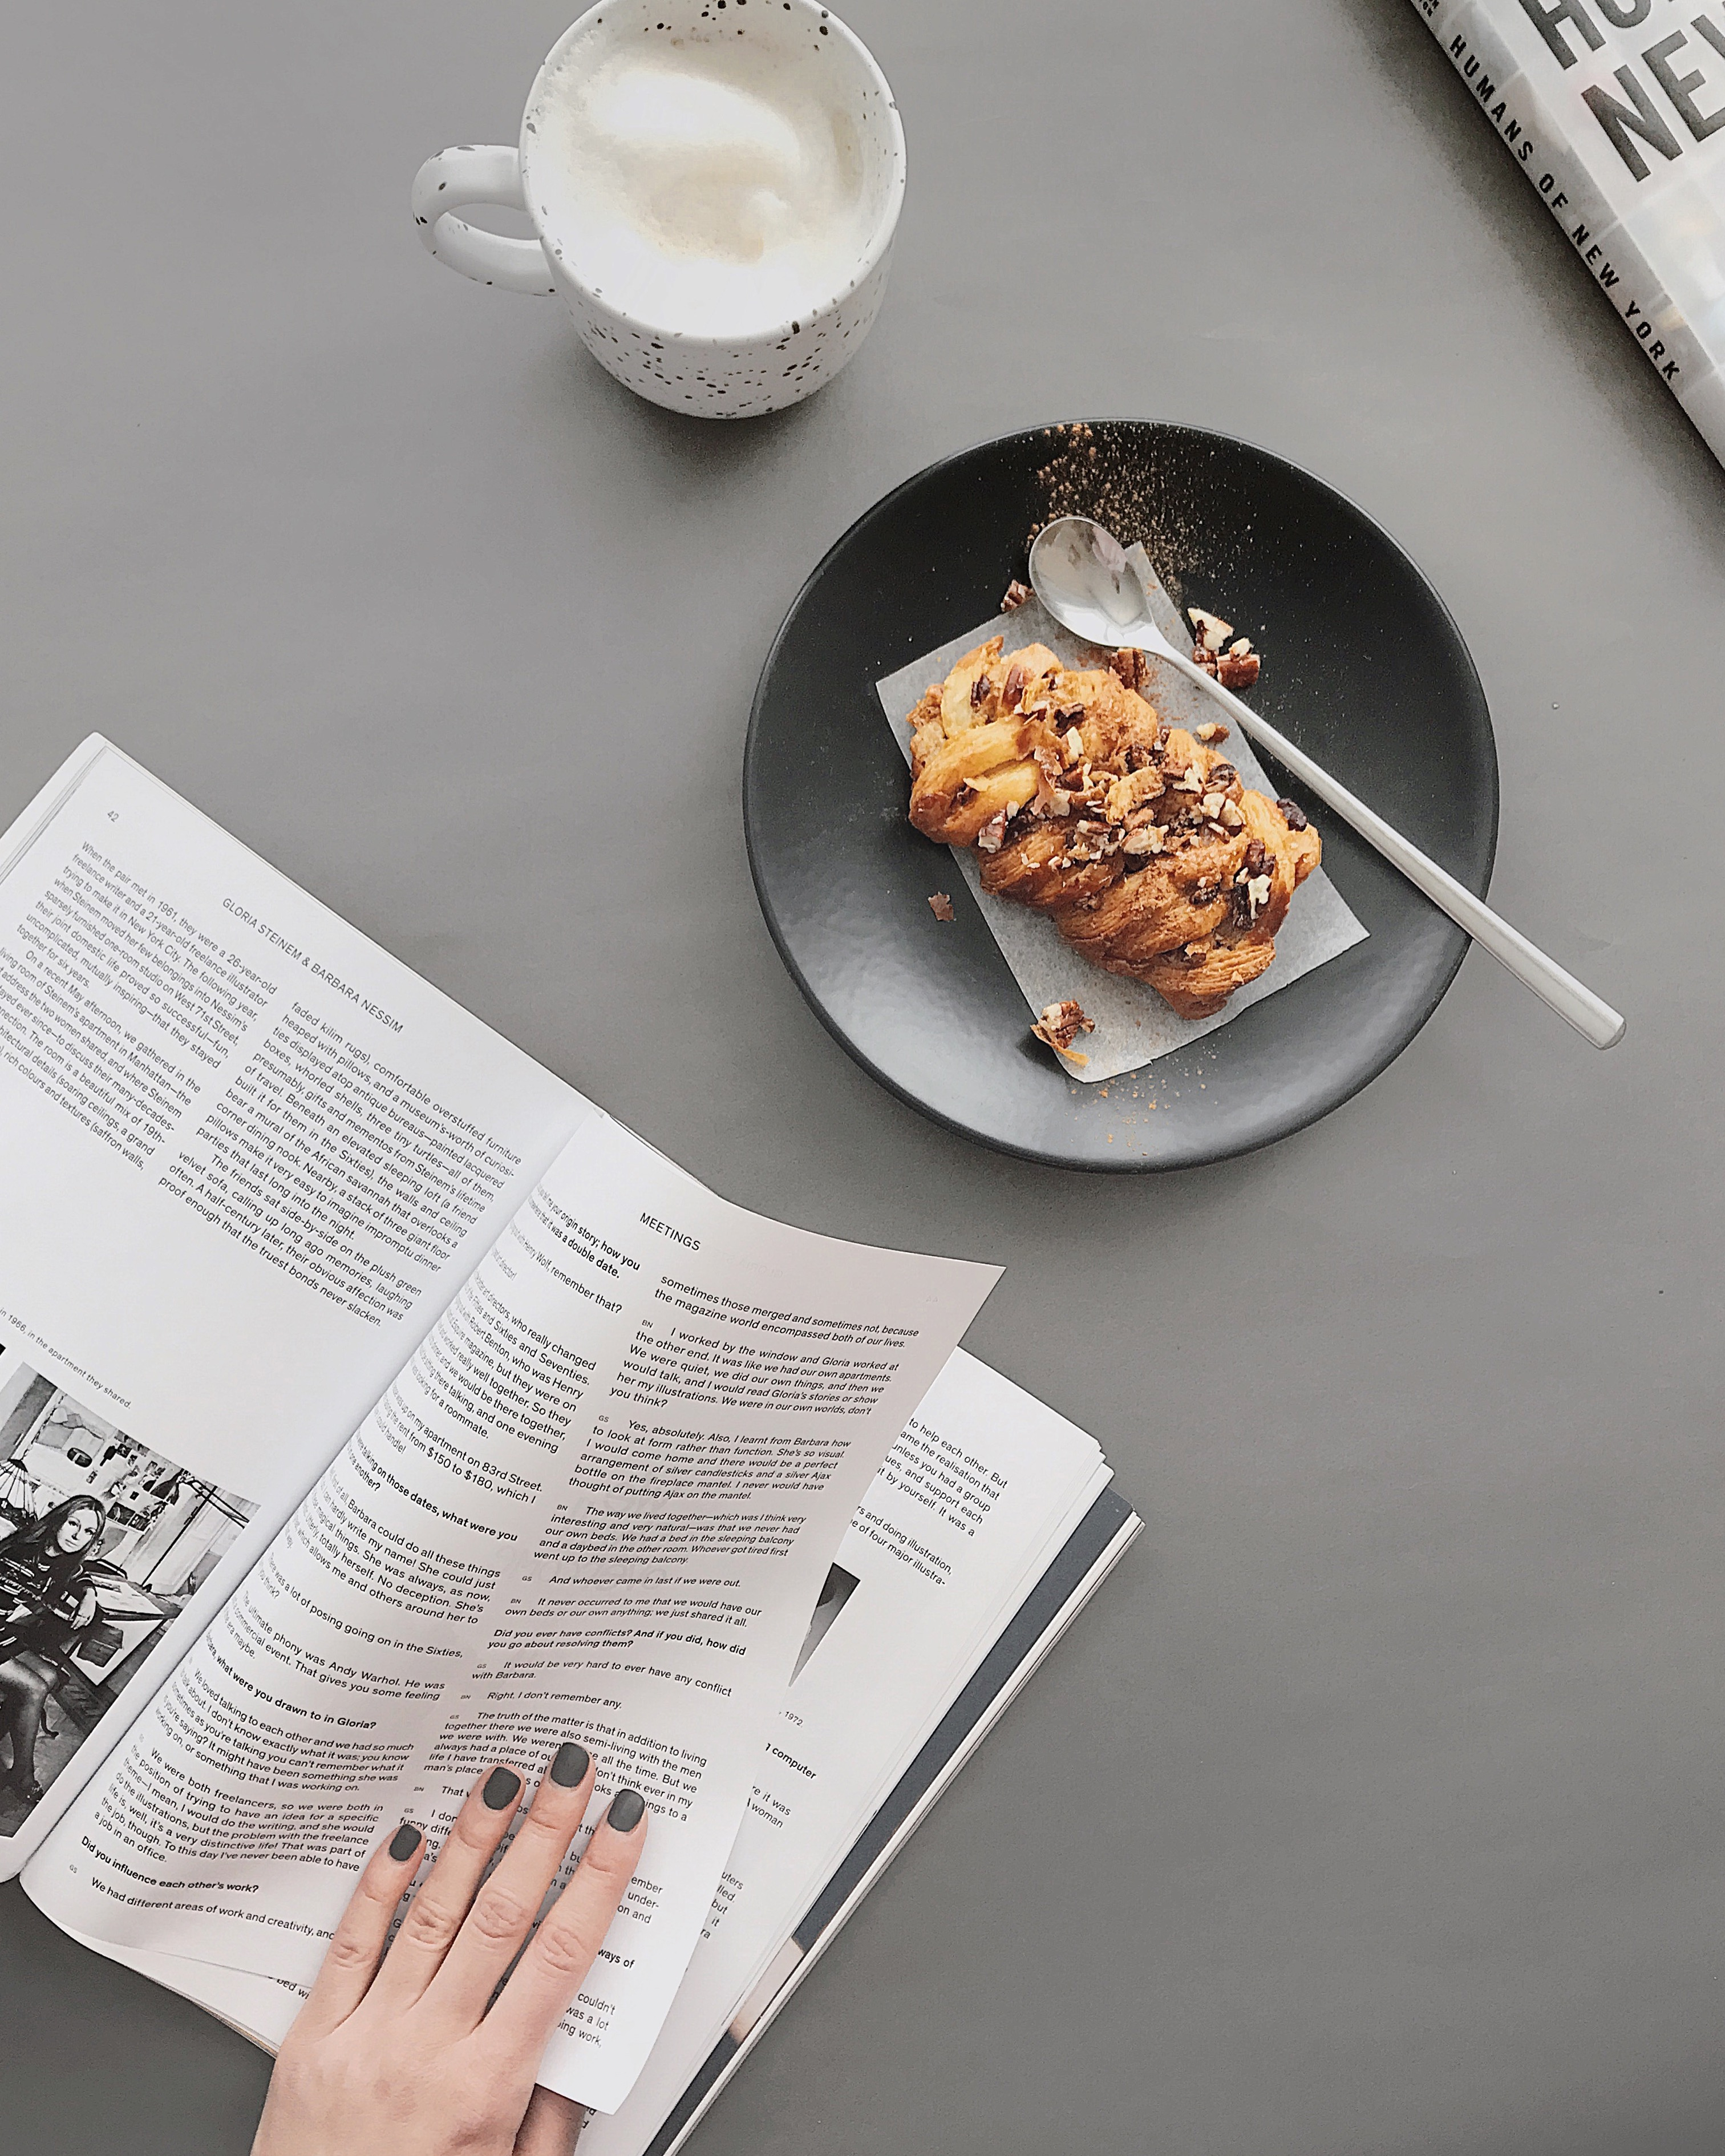 bread on round black plate near white ceramic cup